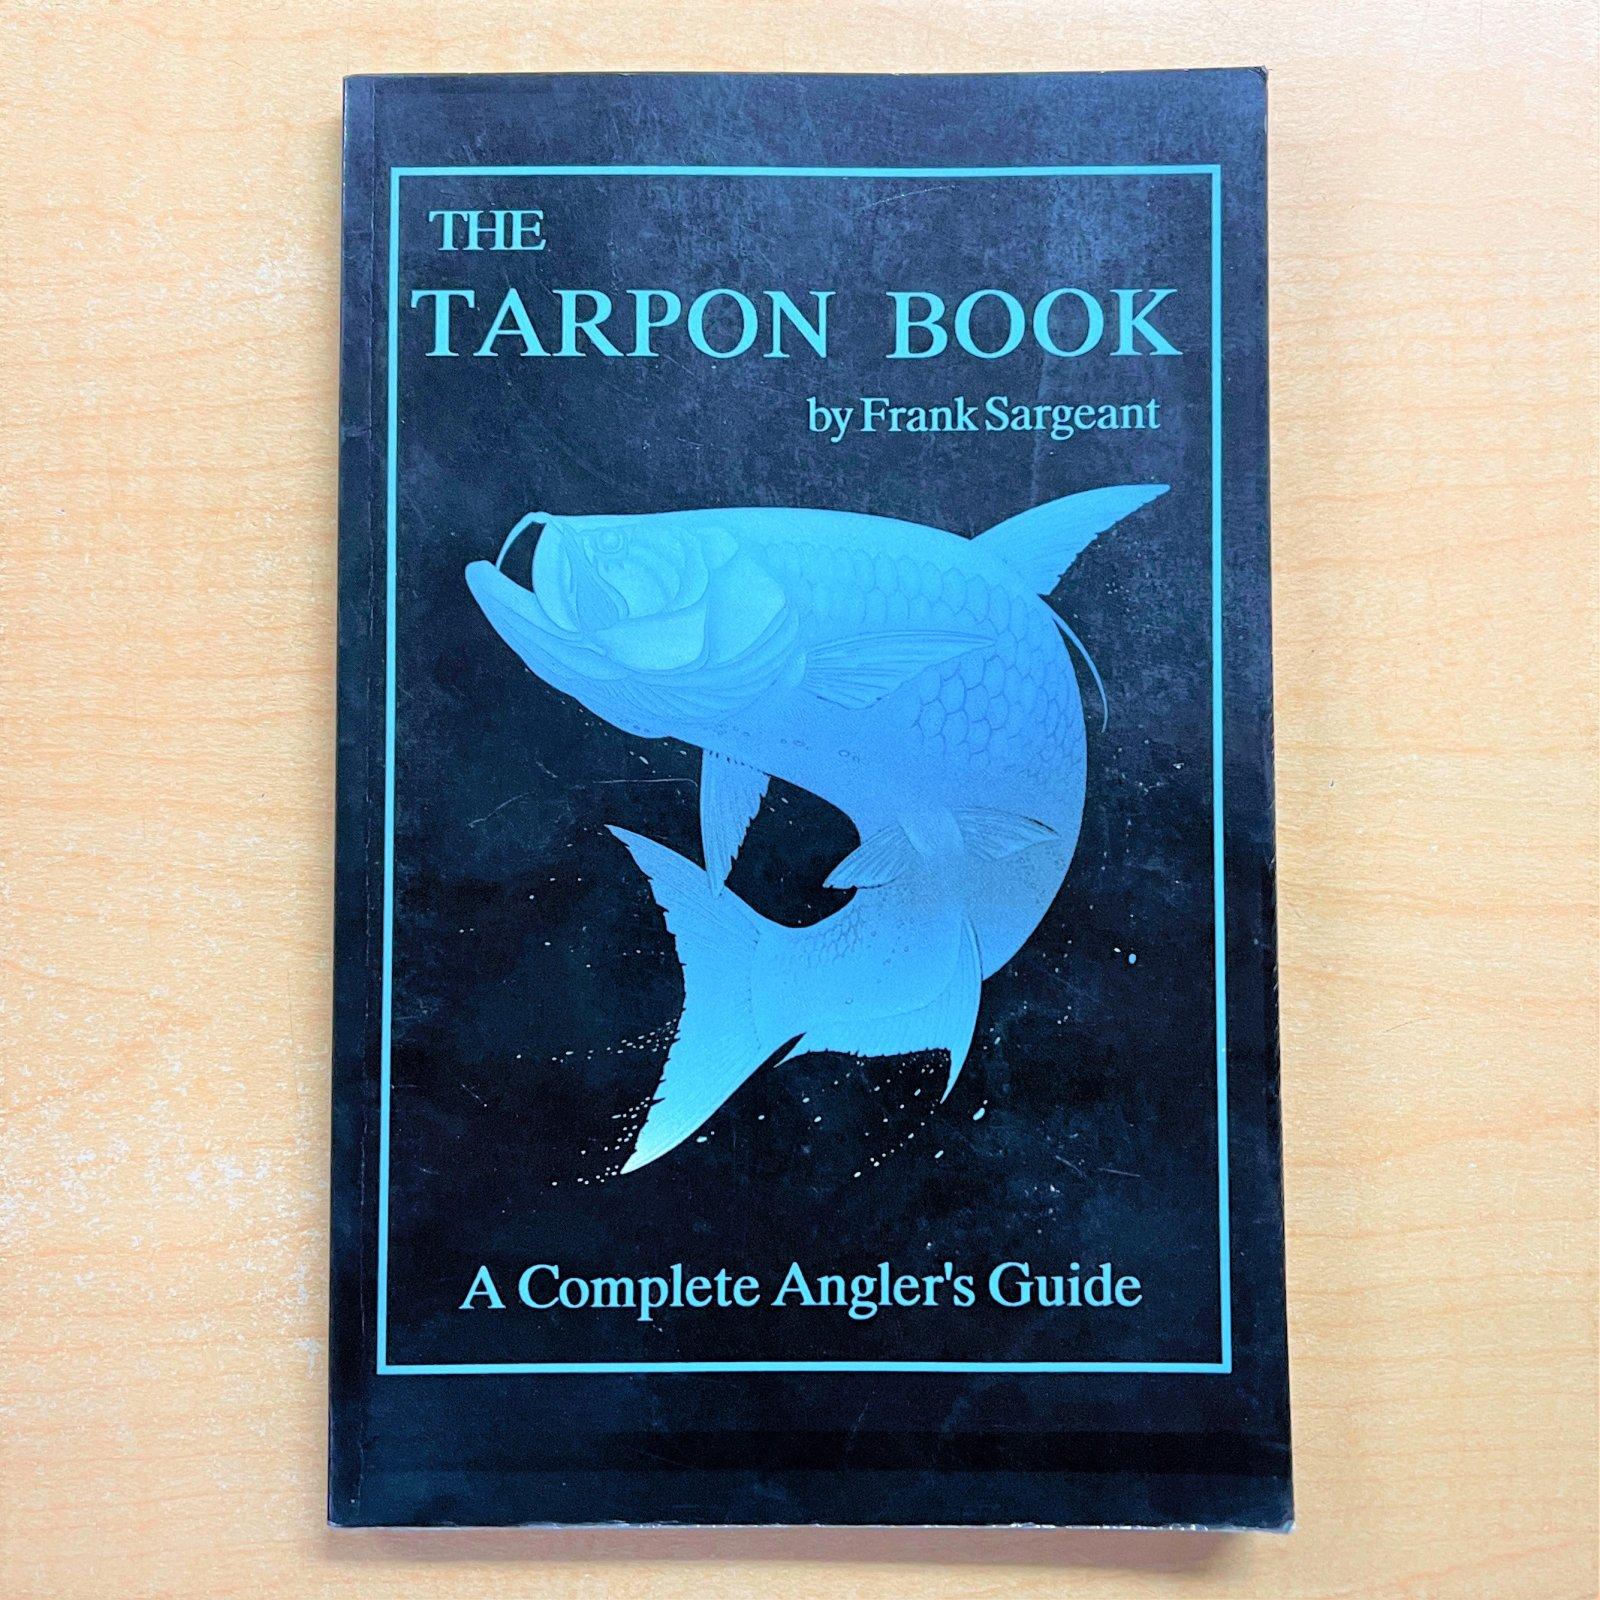 The Tarpon Book